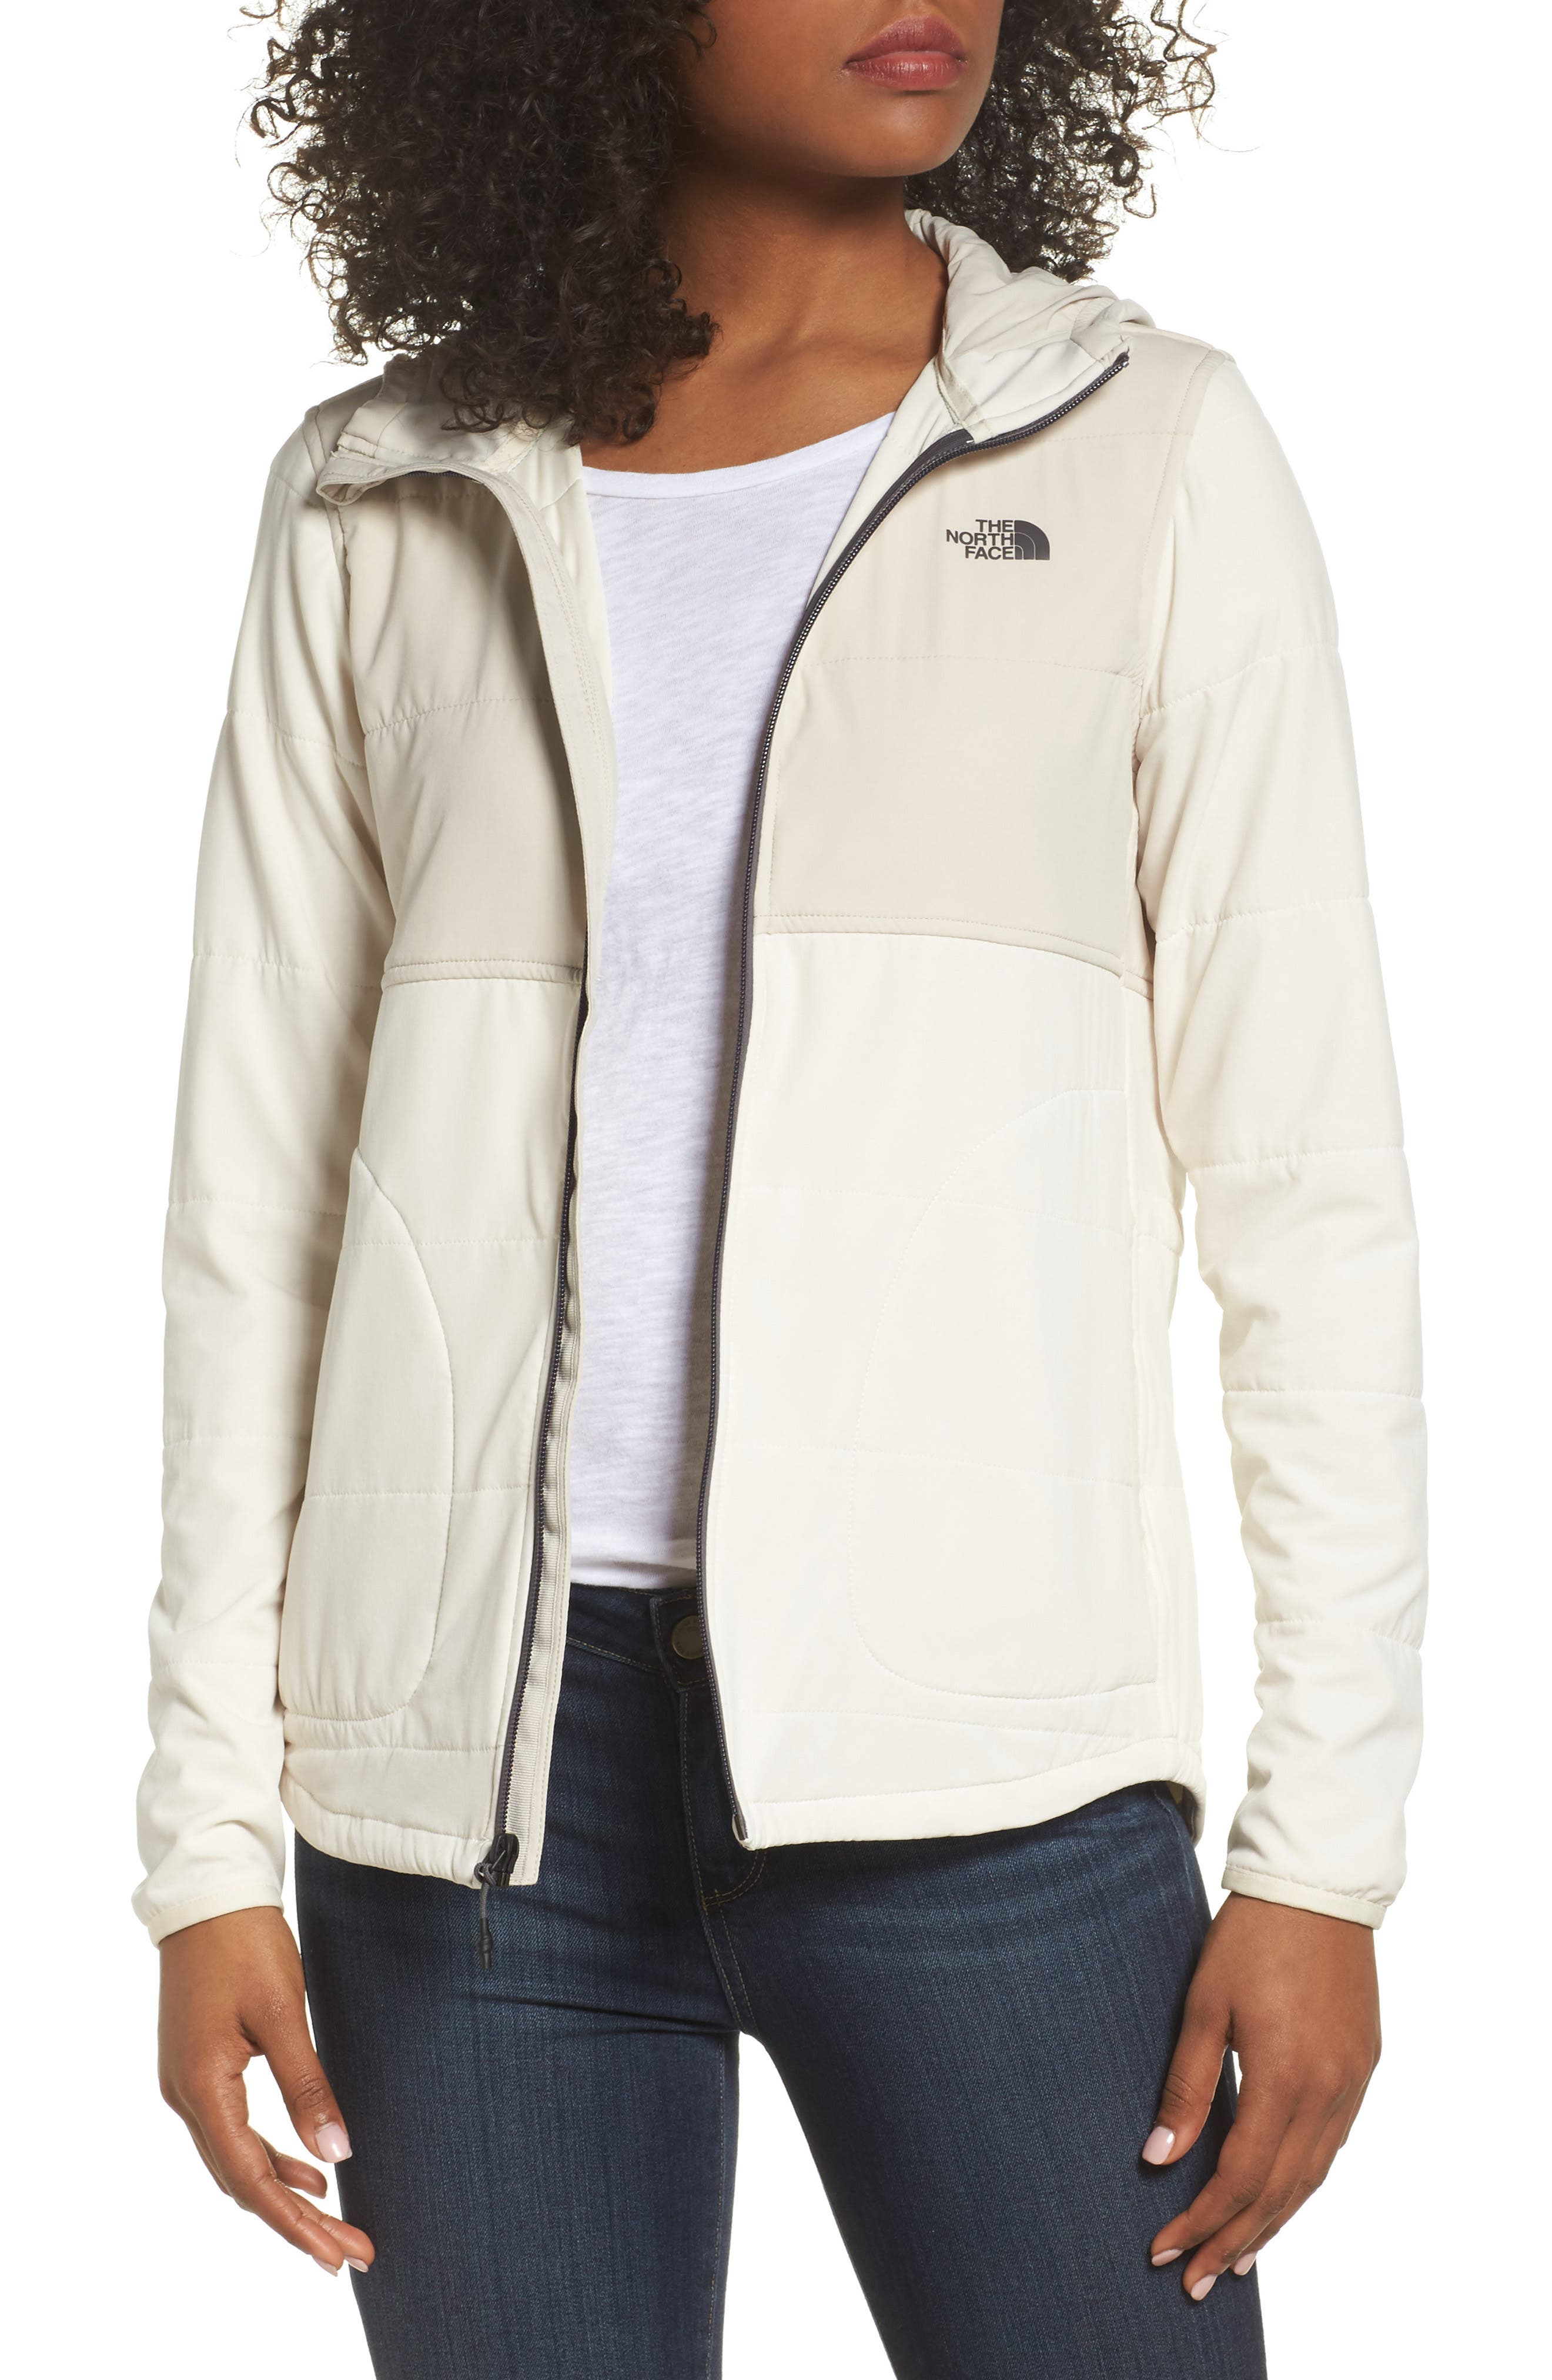 Mountain Sweatshirt Insulated Hooded Jacket,                             Main thumbnail 1, color,                             100